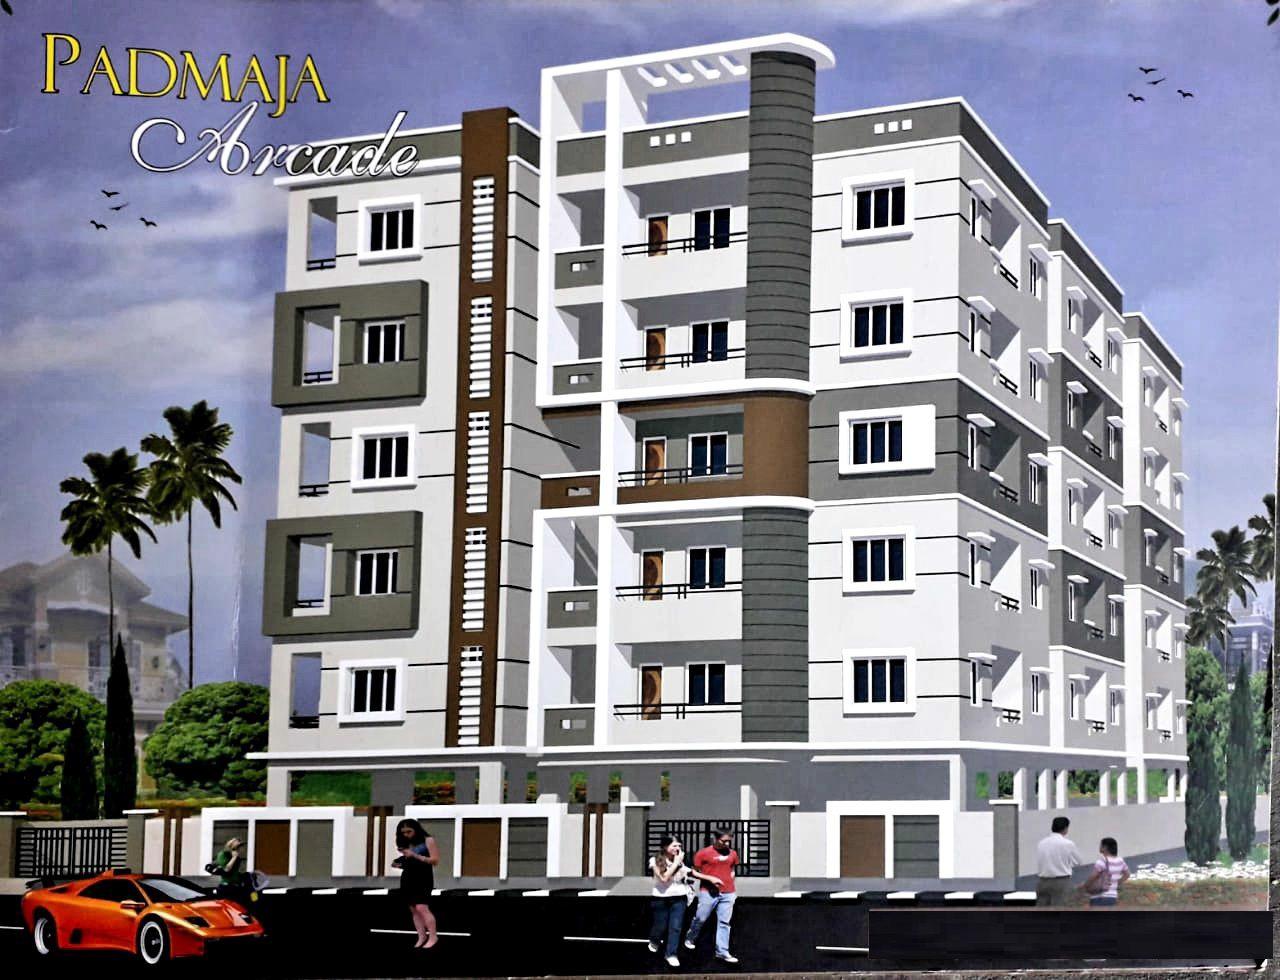 sanjay padmaja arcade project tower view1